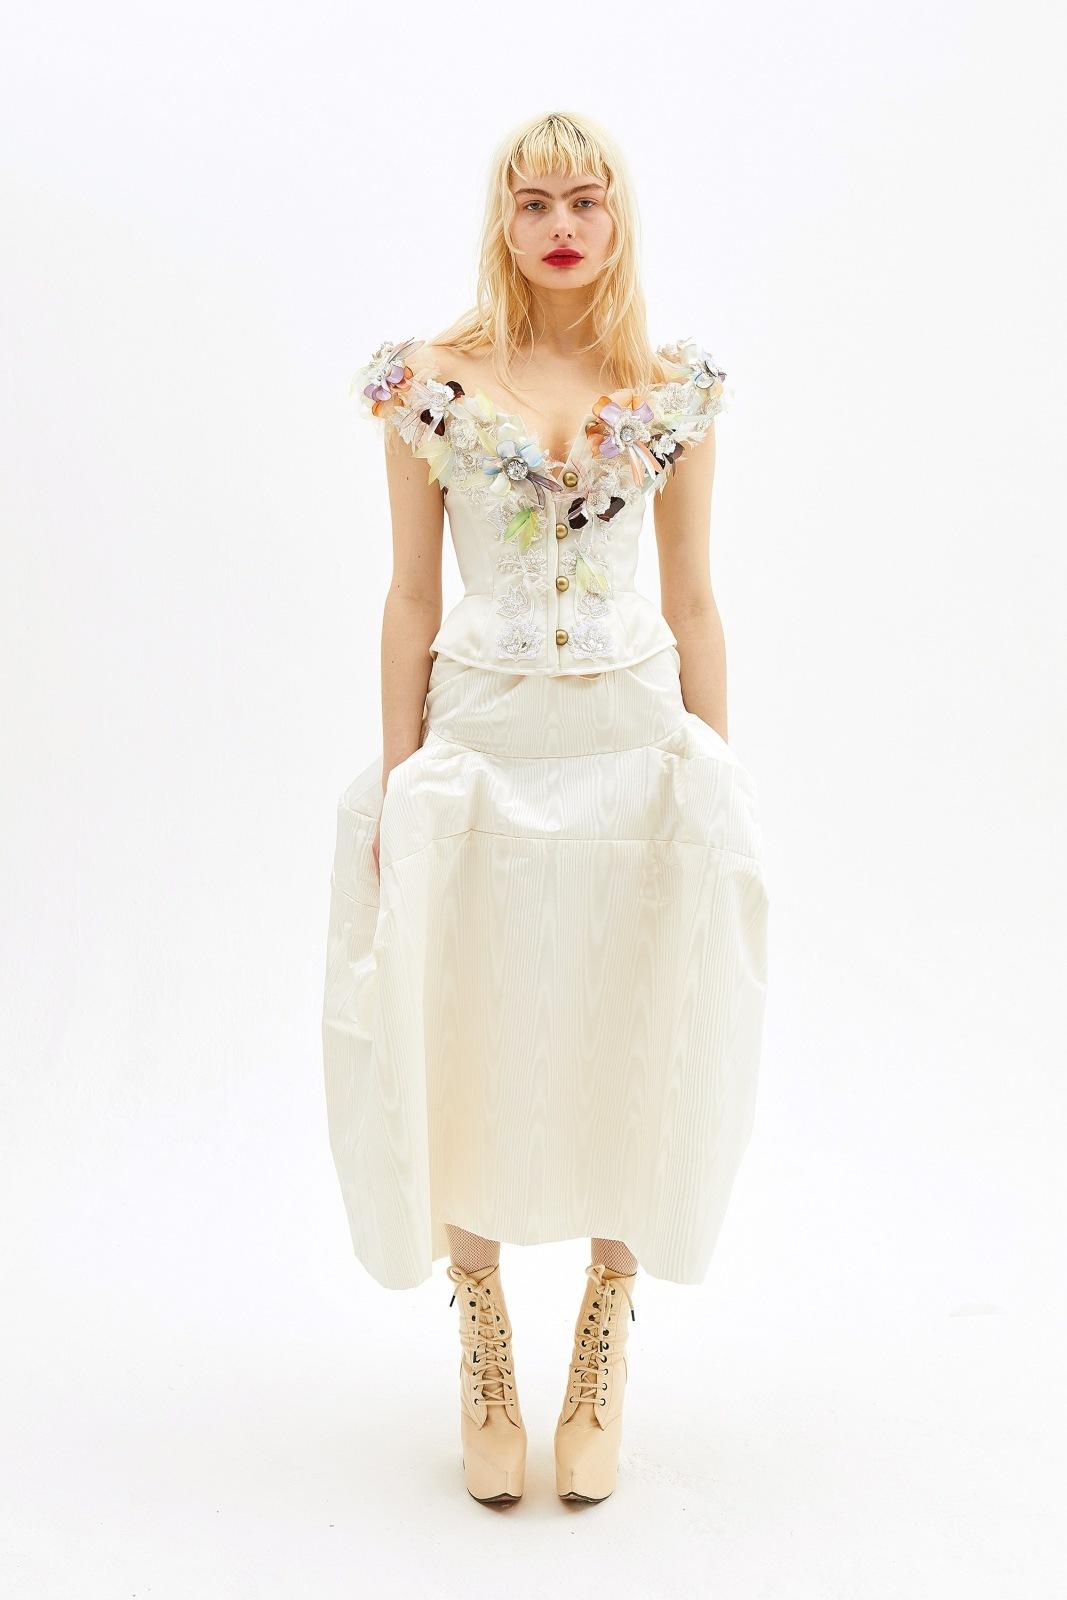 Svatebni Kolekce Ss 19 Od Vivienne Westwood Klasiku Necekejte